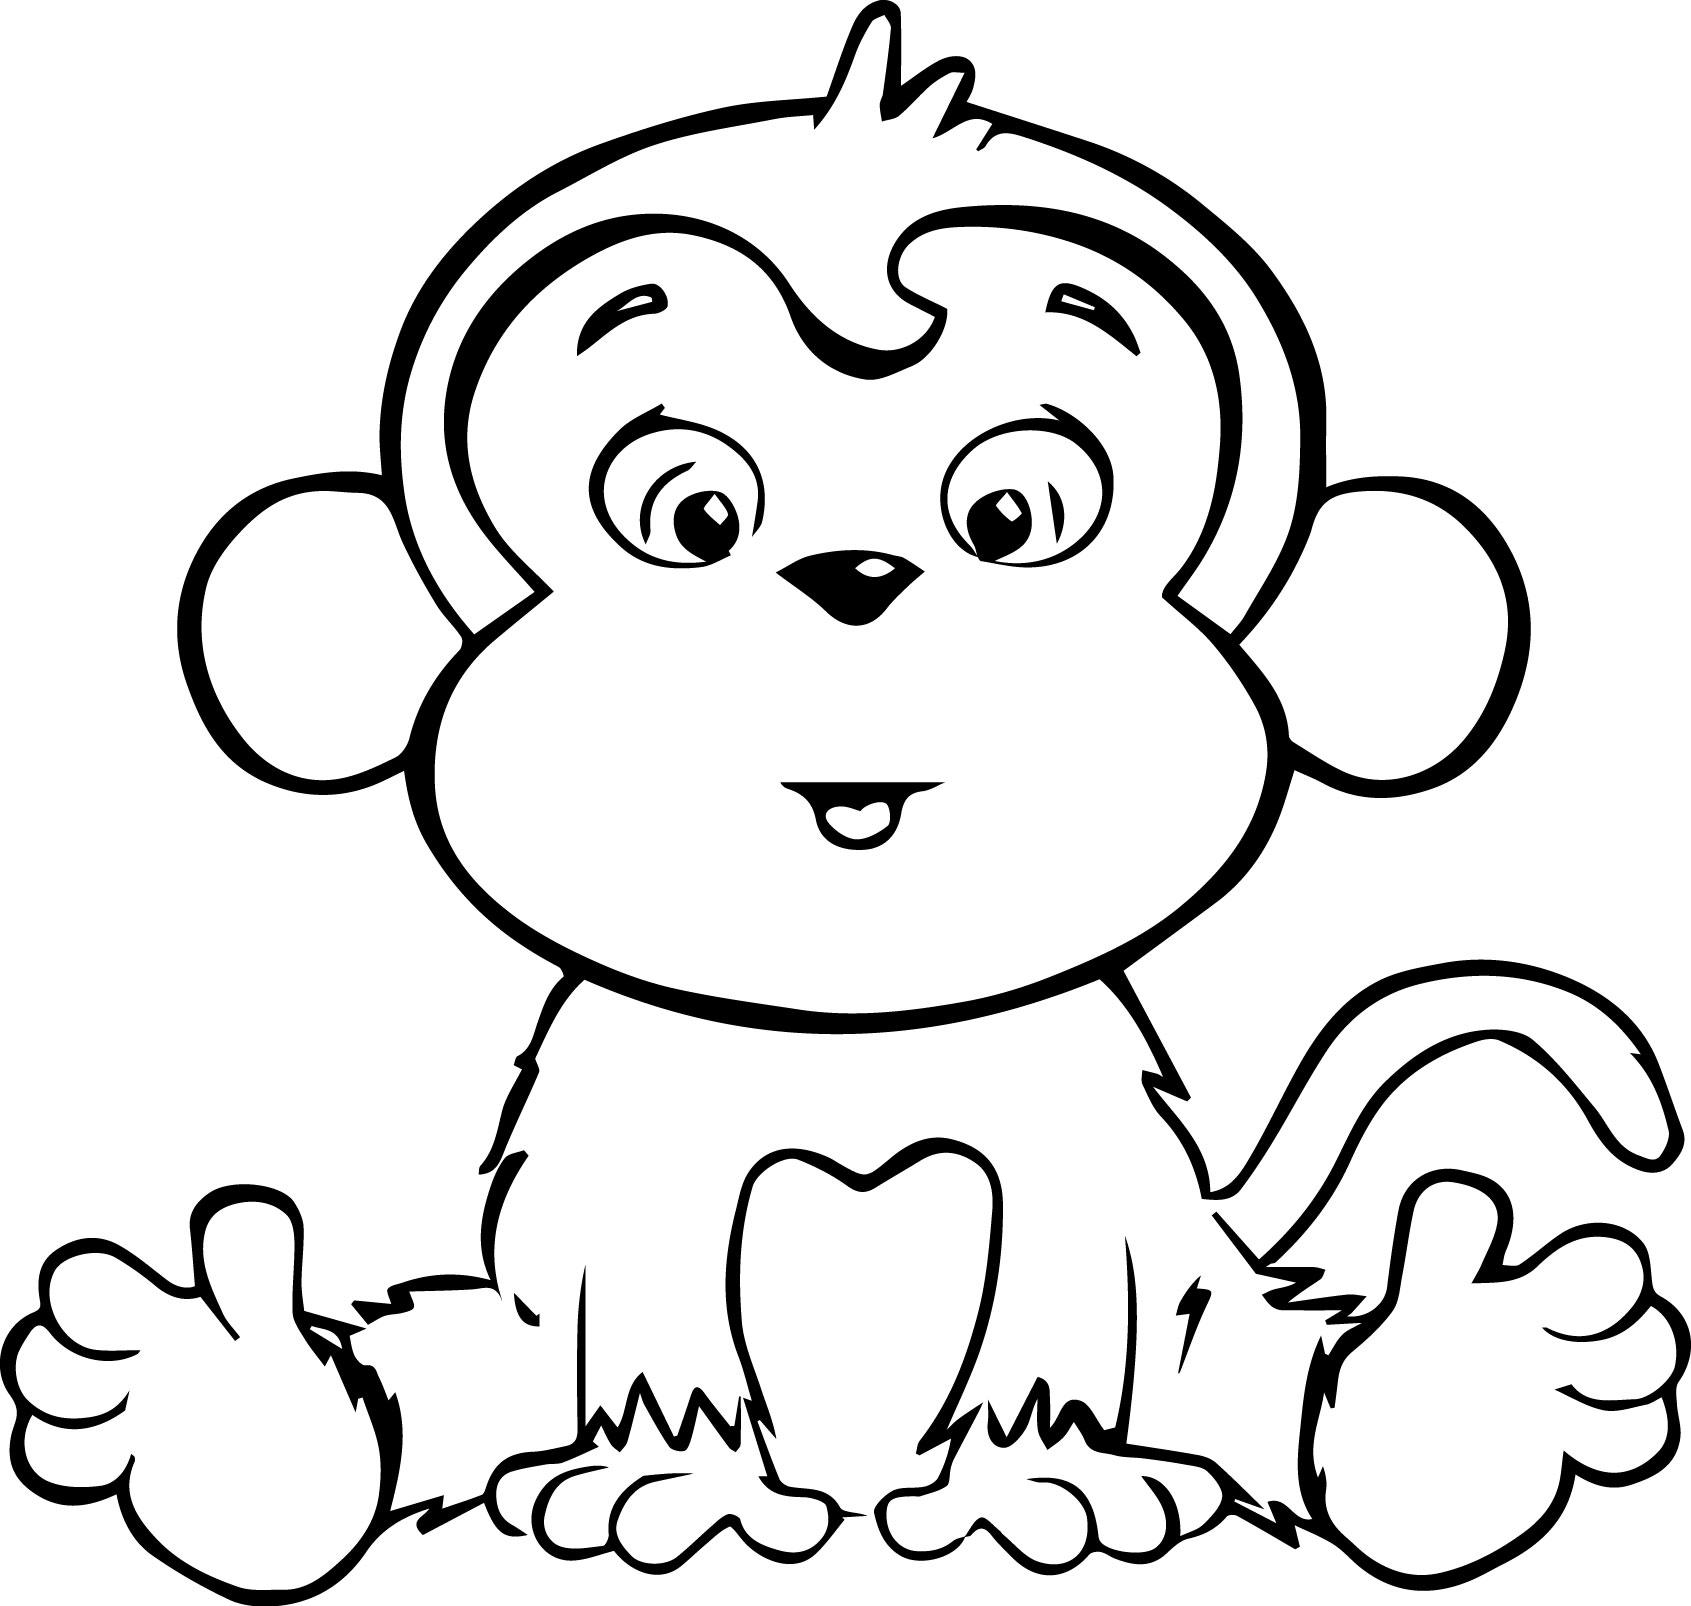 Colouring Monkey